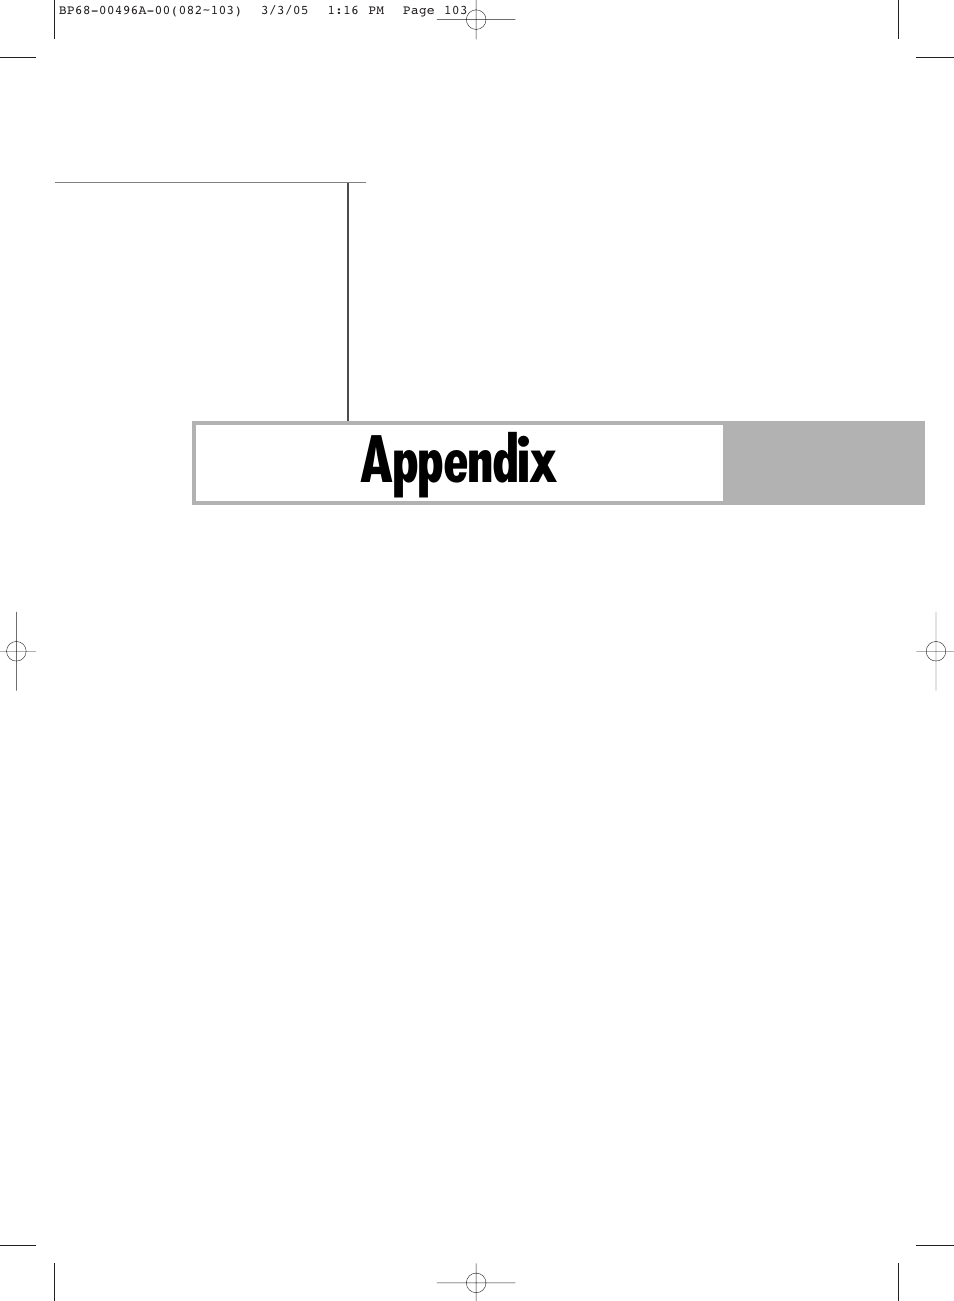 appendix samsung hlr4266wx xaa user manual page 103 108 rh manualsdir com